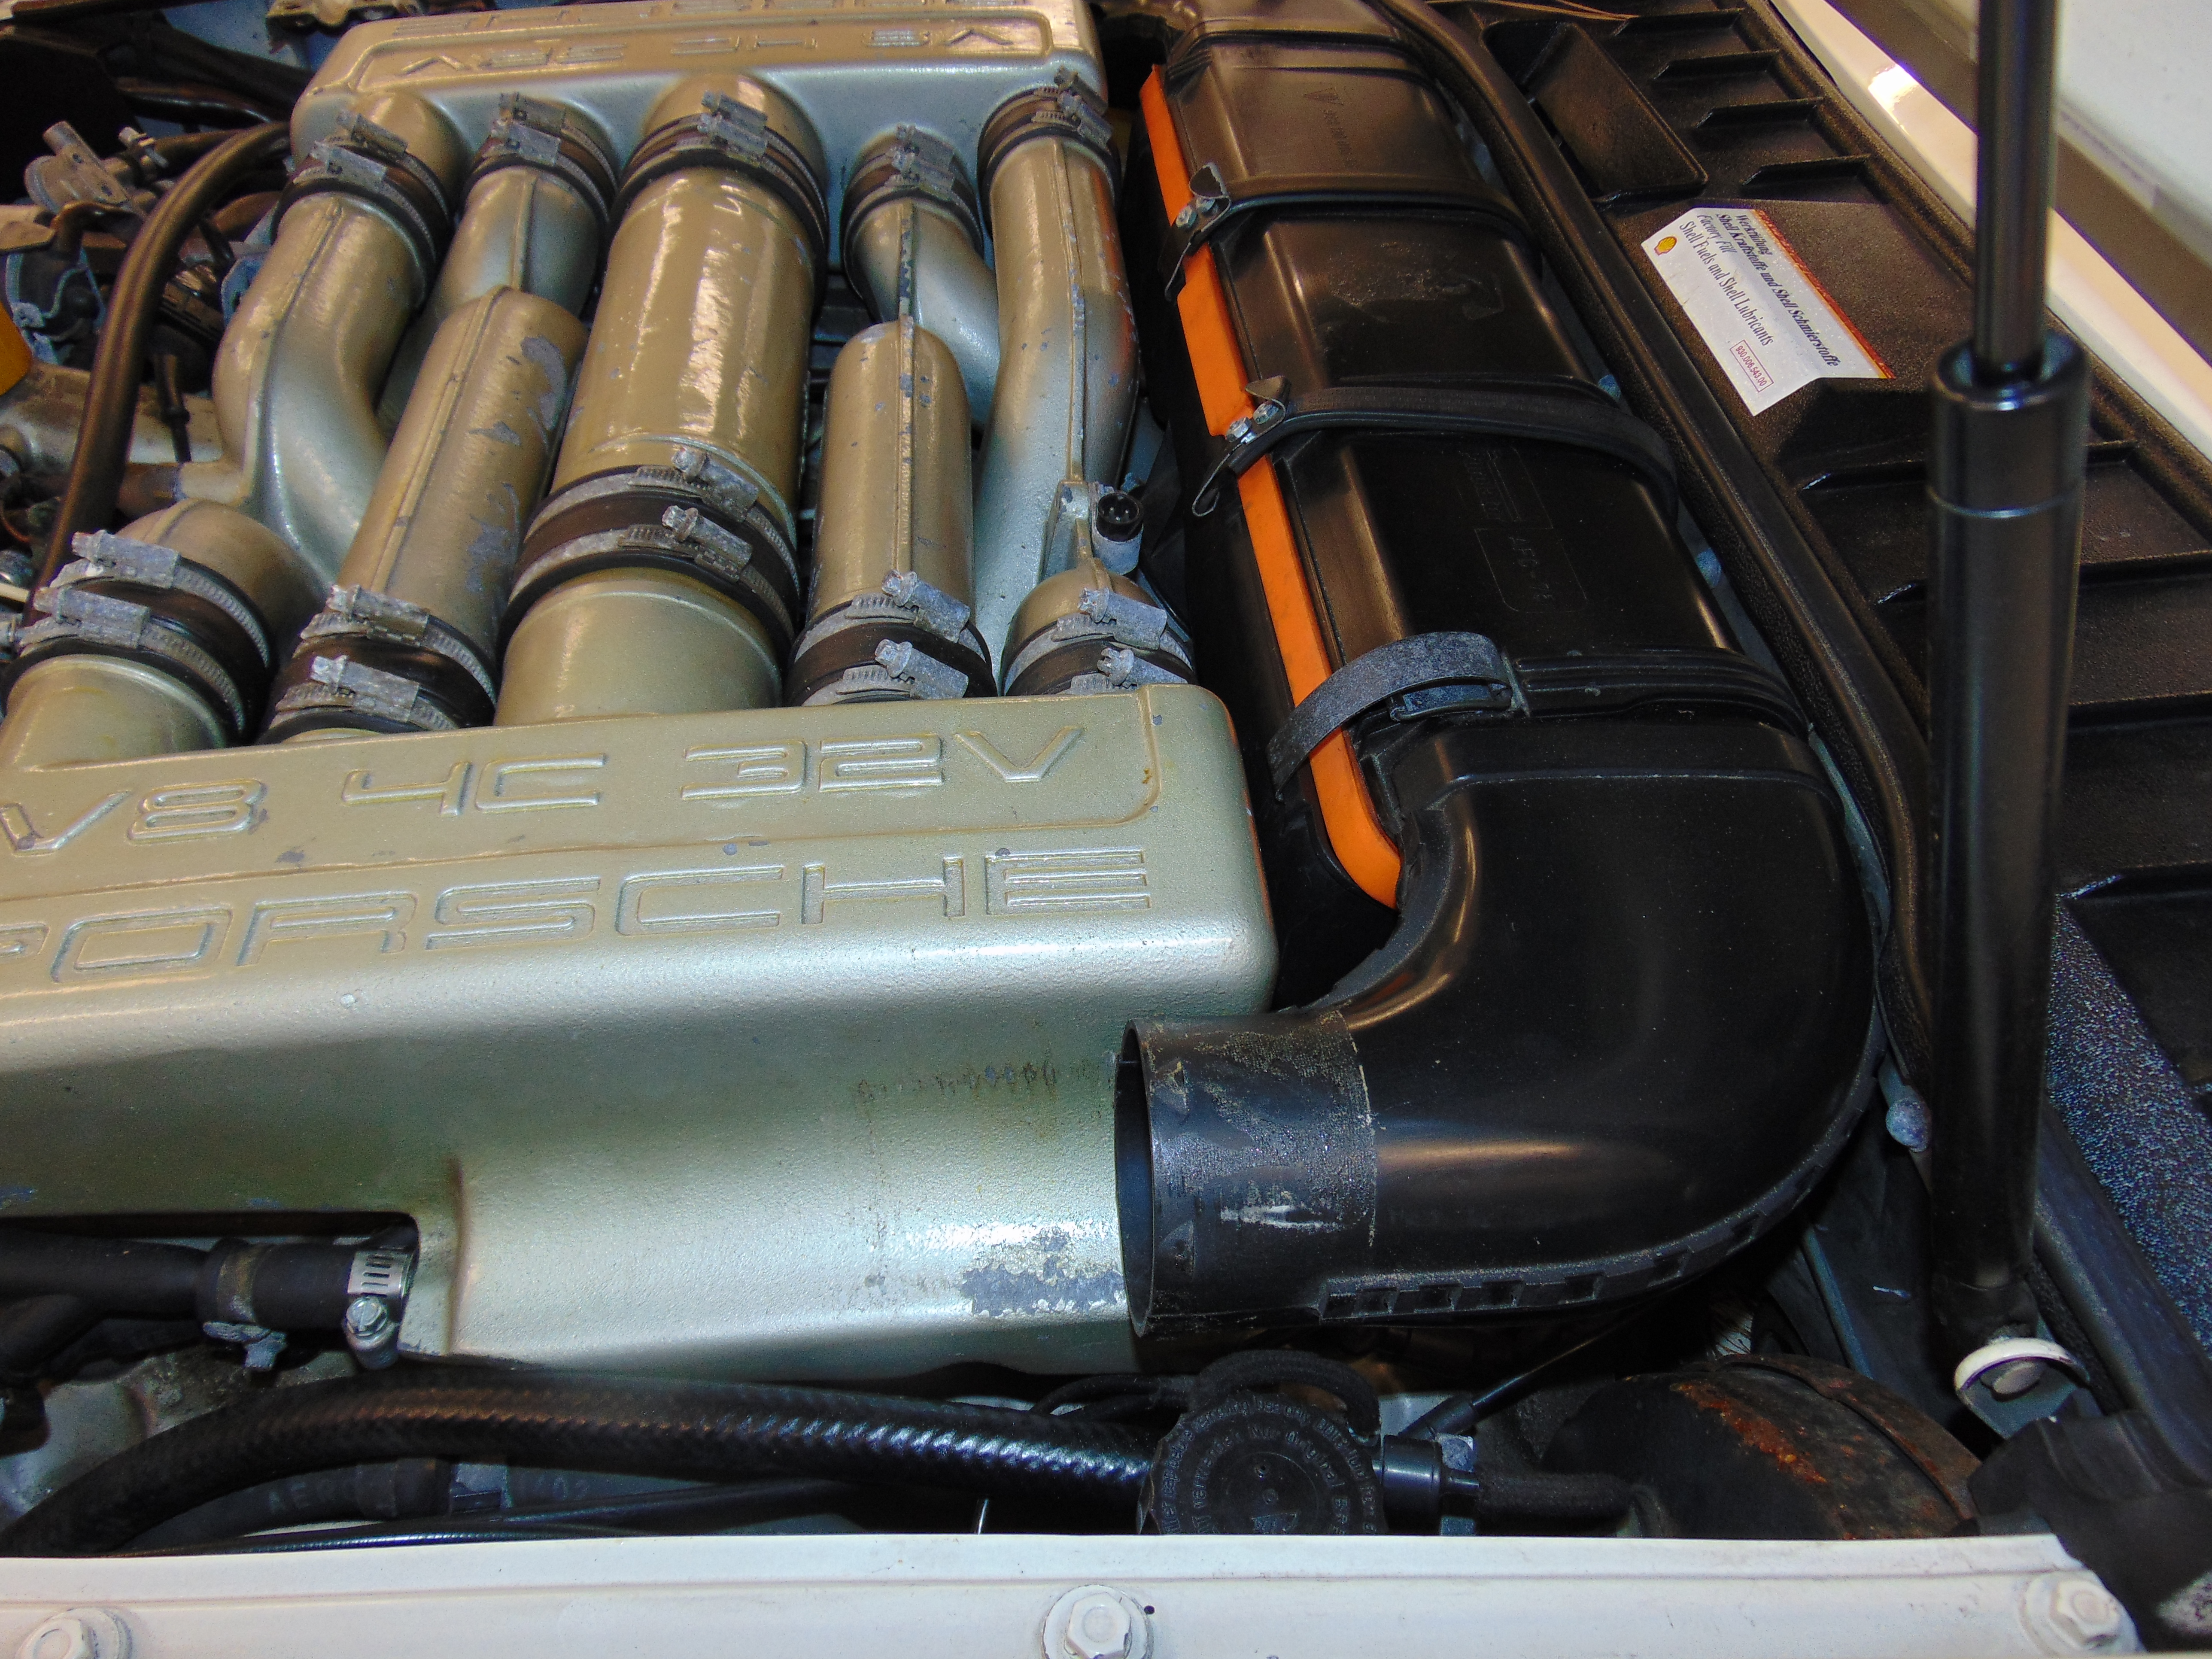 1978 Bmw 320i Wiring Diagram Electrical 1982 Porsche 928 Engine Vacuum Saturn Egr Valve Girl 1993 325i